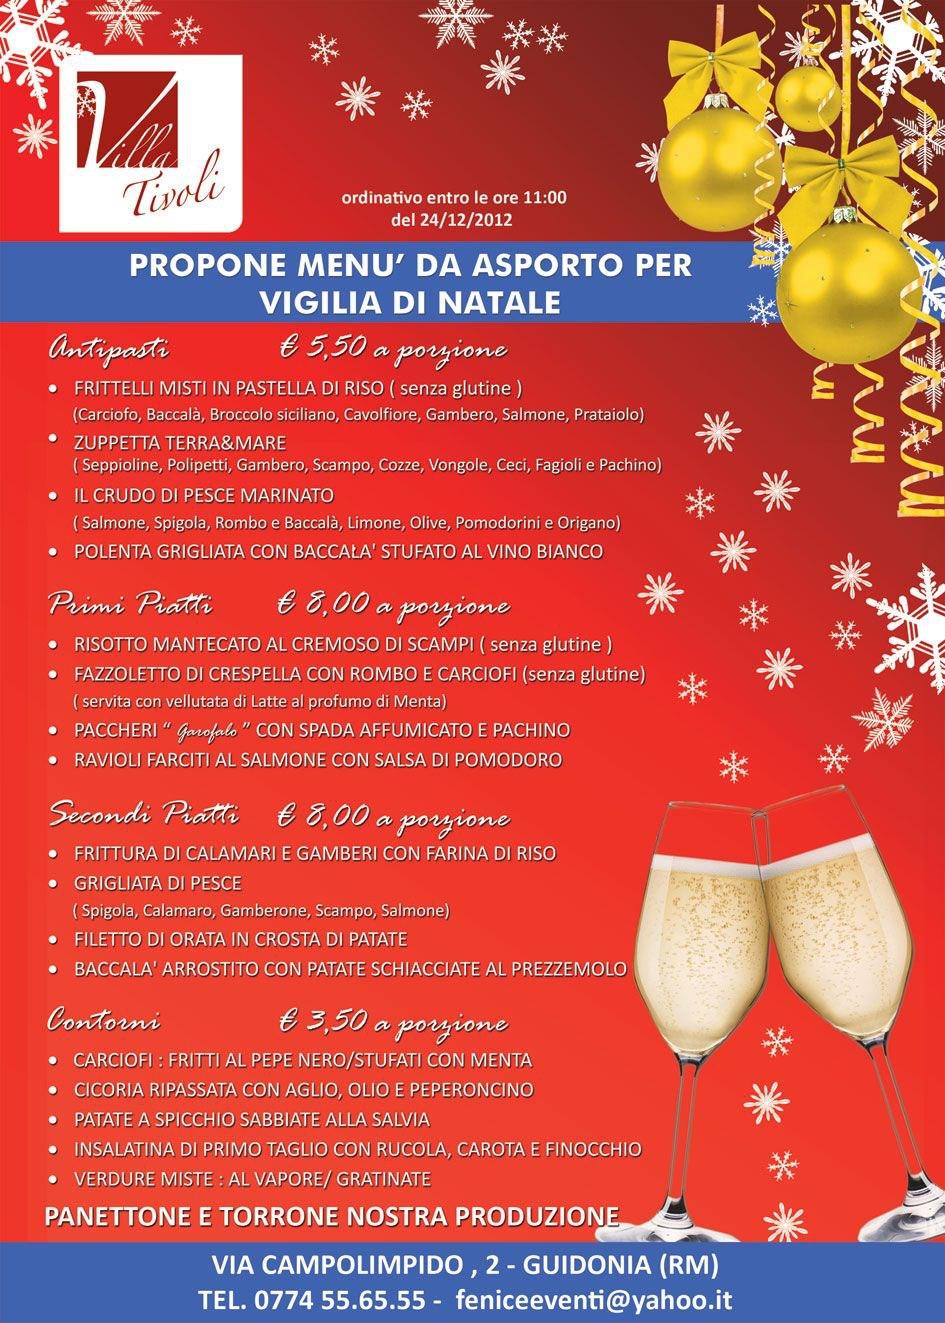 Menu Cenone Di Natale.Villa Tivoli Menu D Asporto Cenone Natale Villa Tivoli